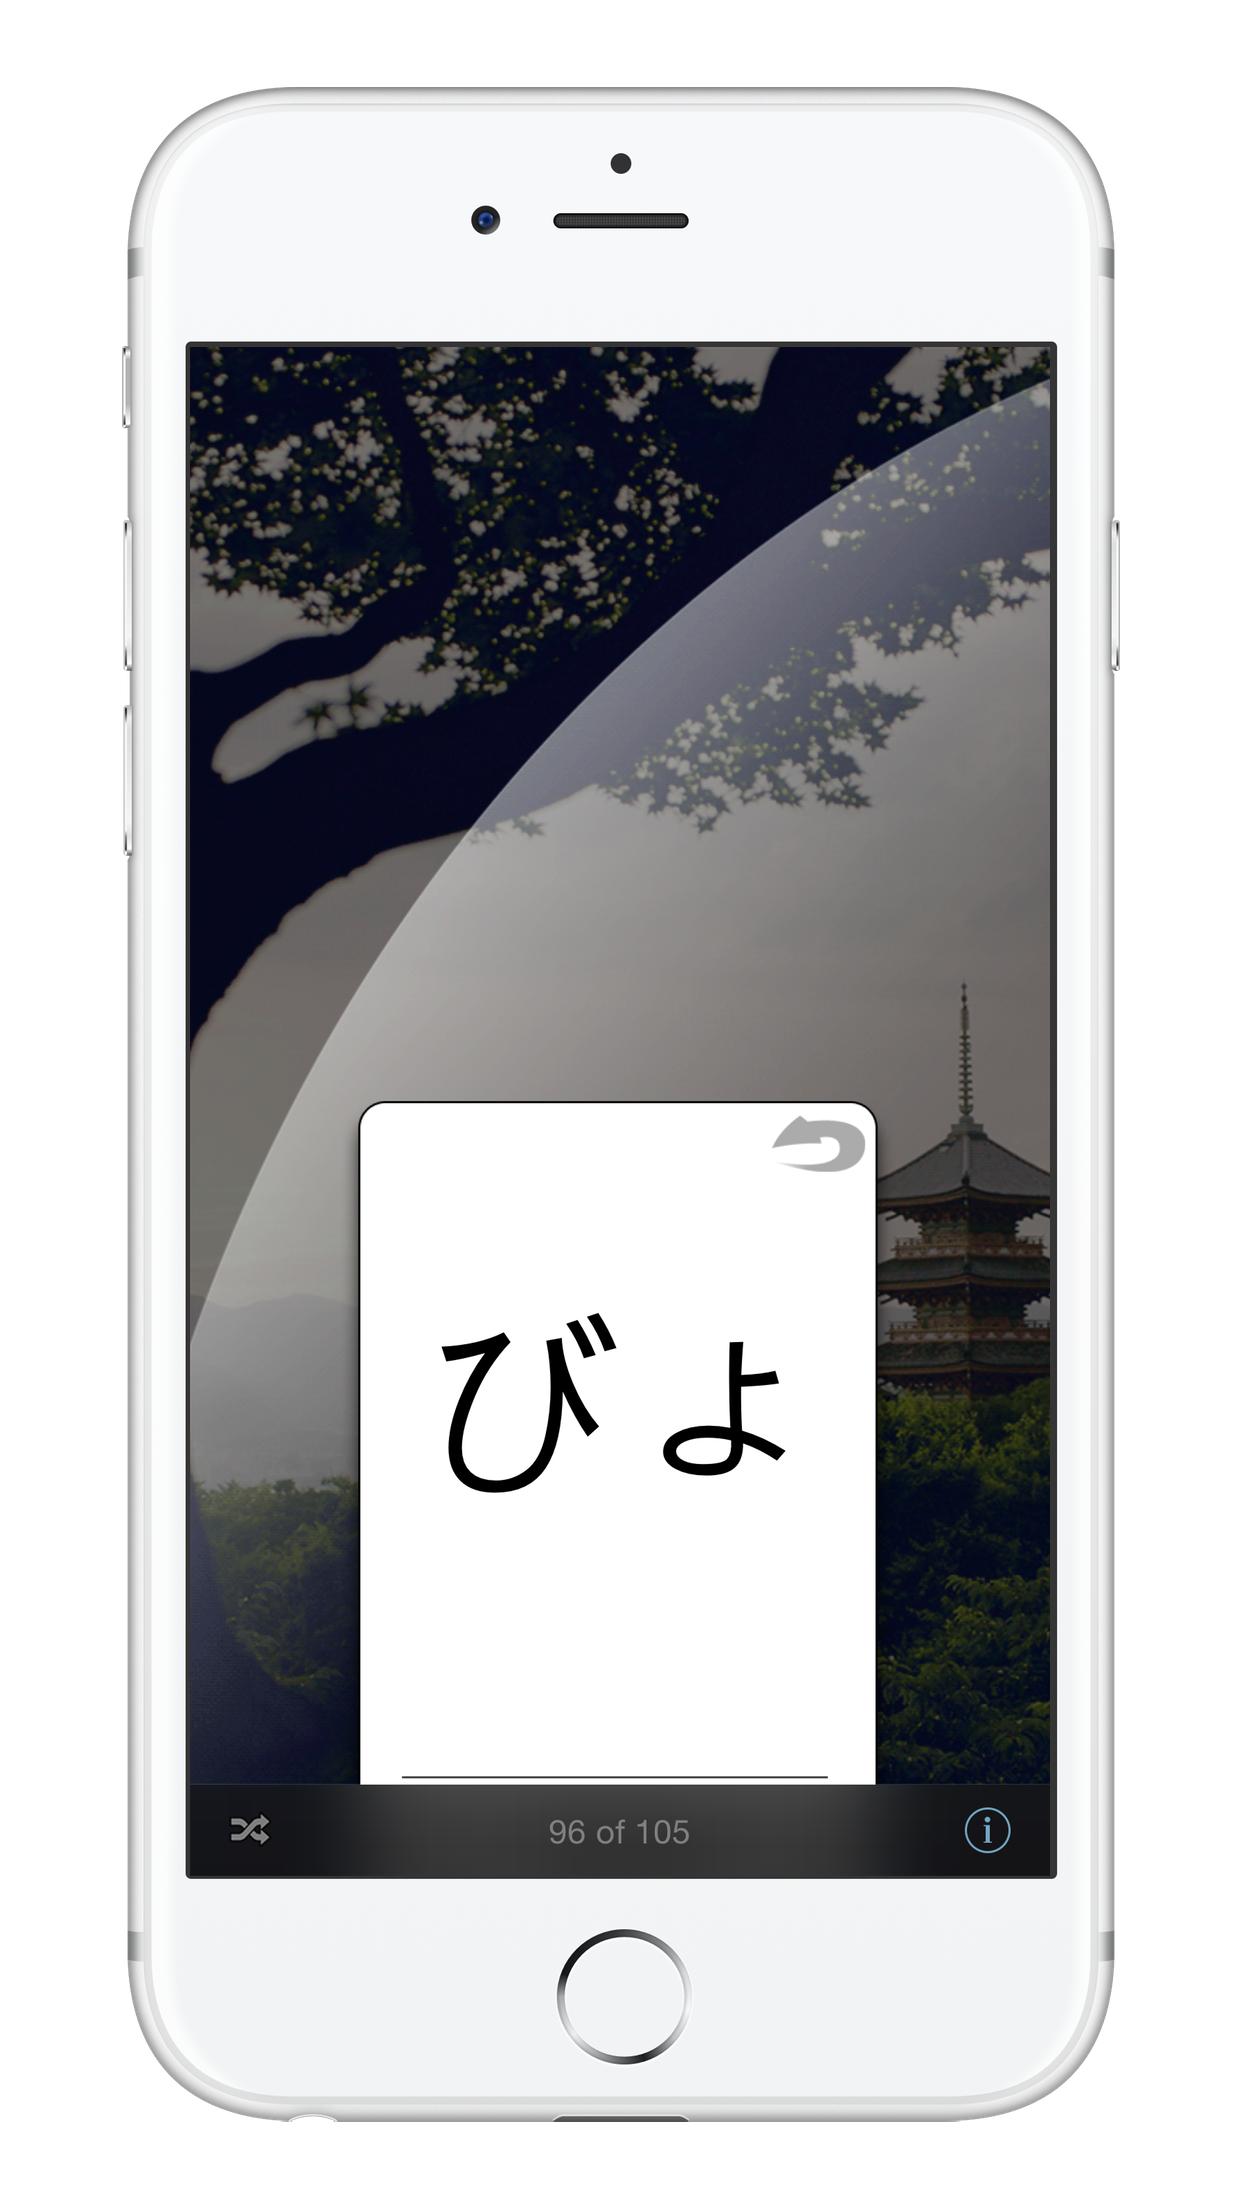 Hiragana screenshot 4.png